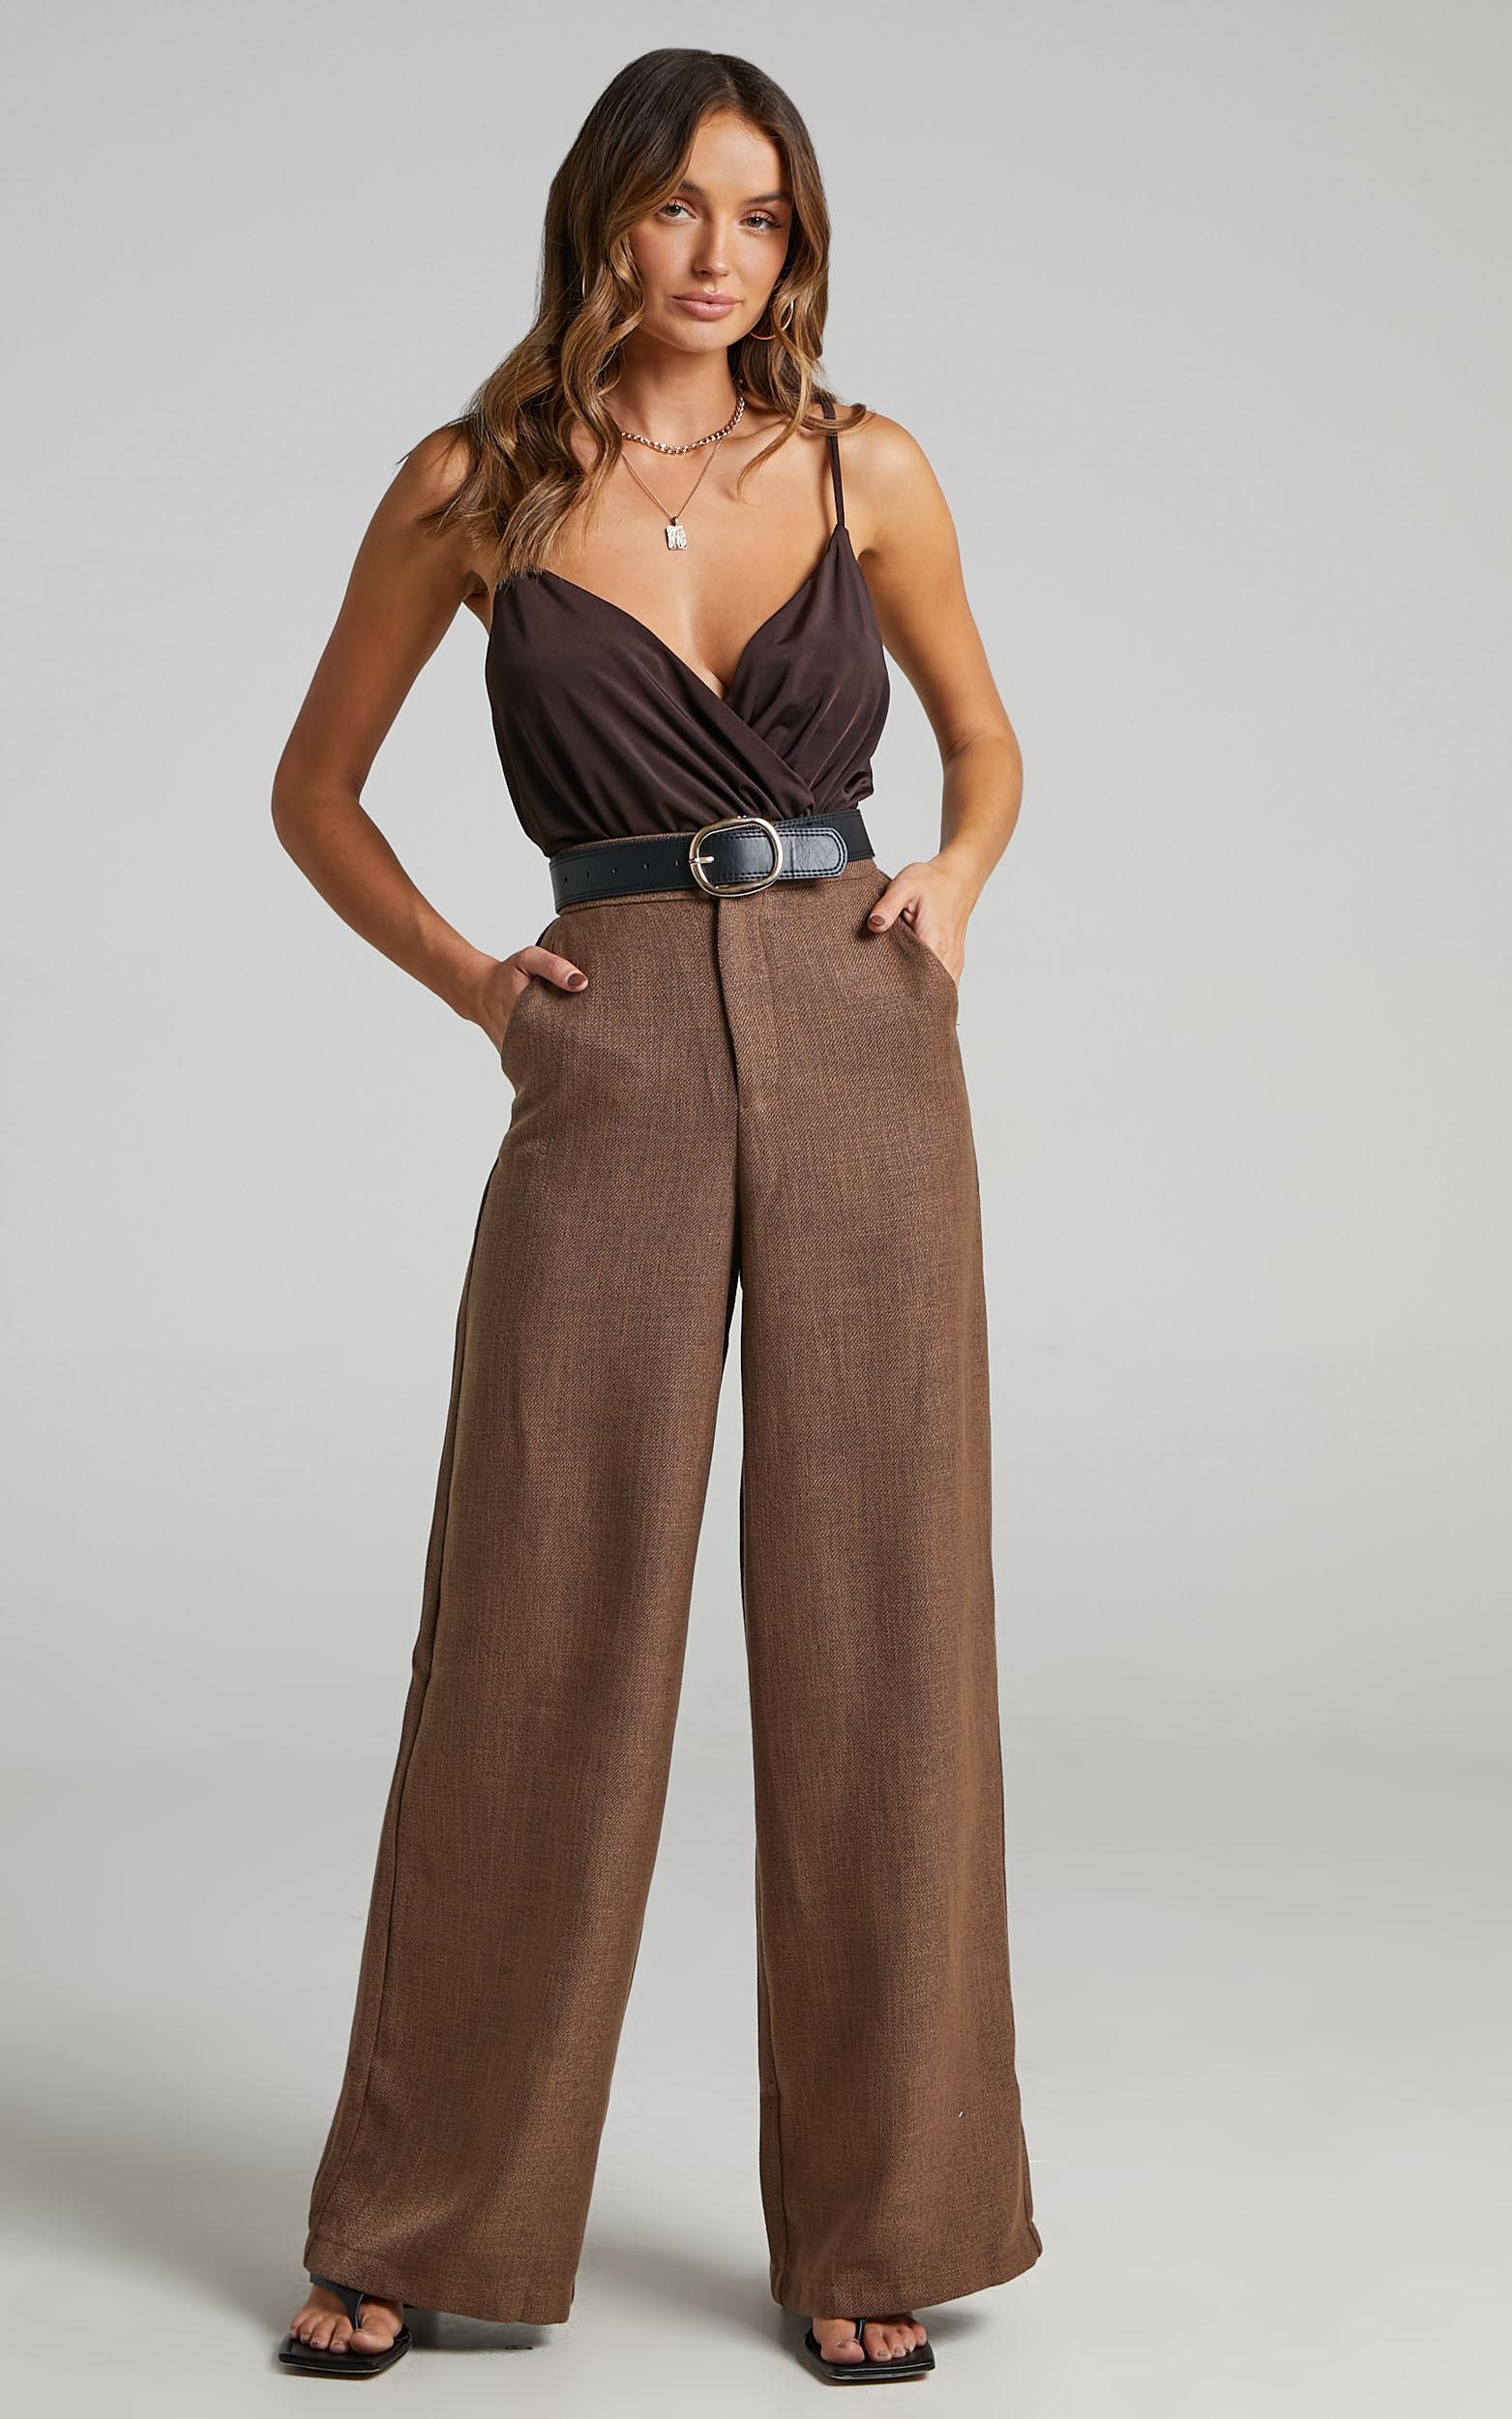 Jacintah Twill Pants in Chocolate - 16, BRN1, hi-res image number null